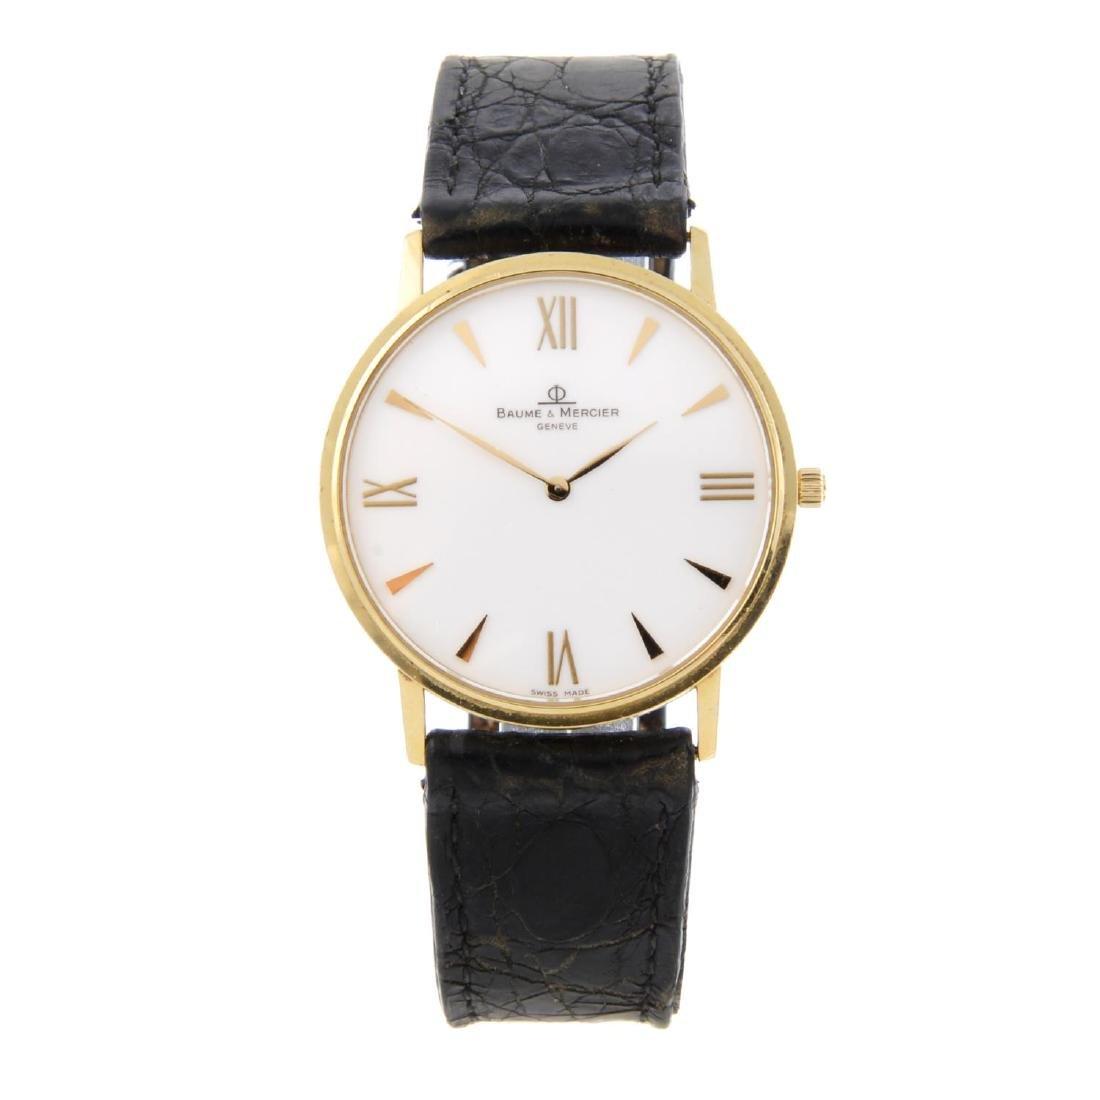 BAUME & MERCIER - a gentleman's Classima wrist watch.